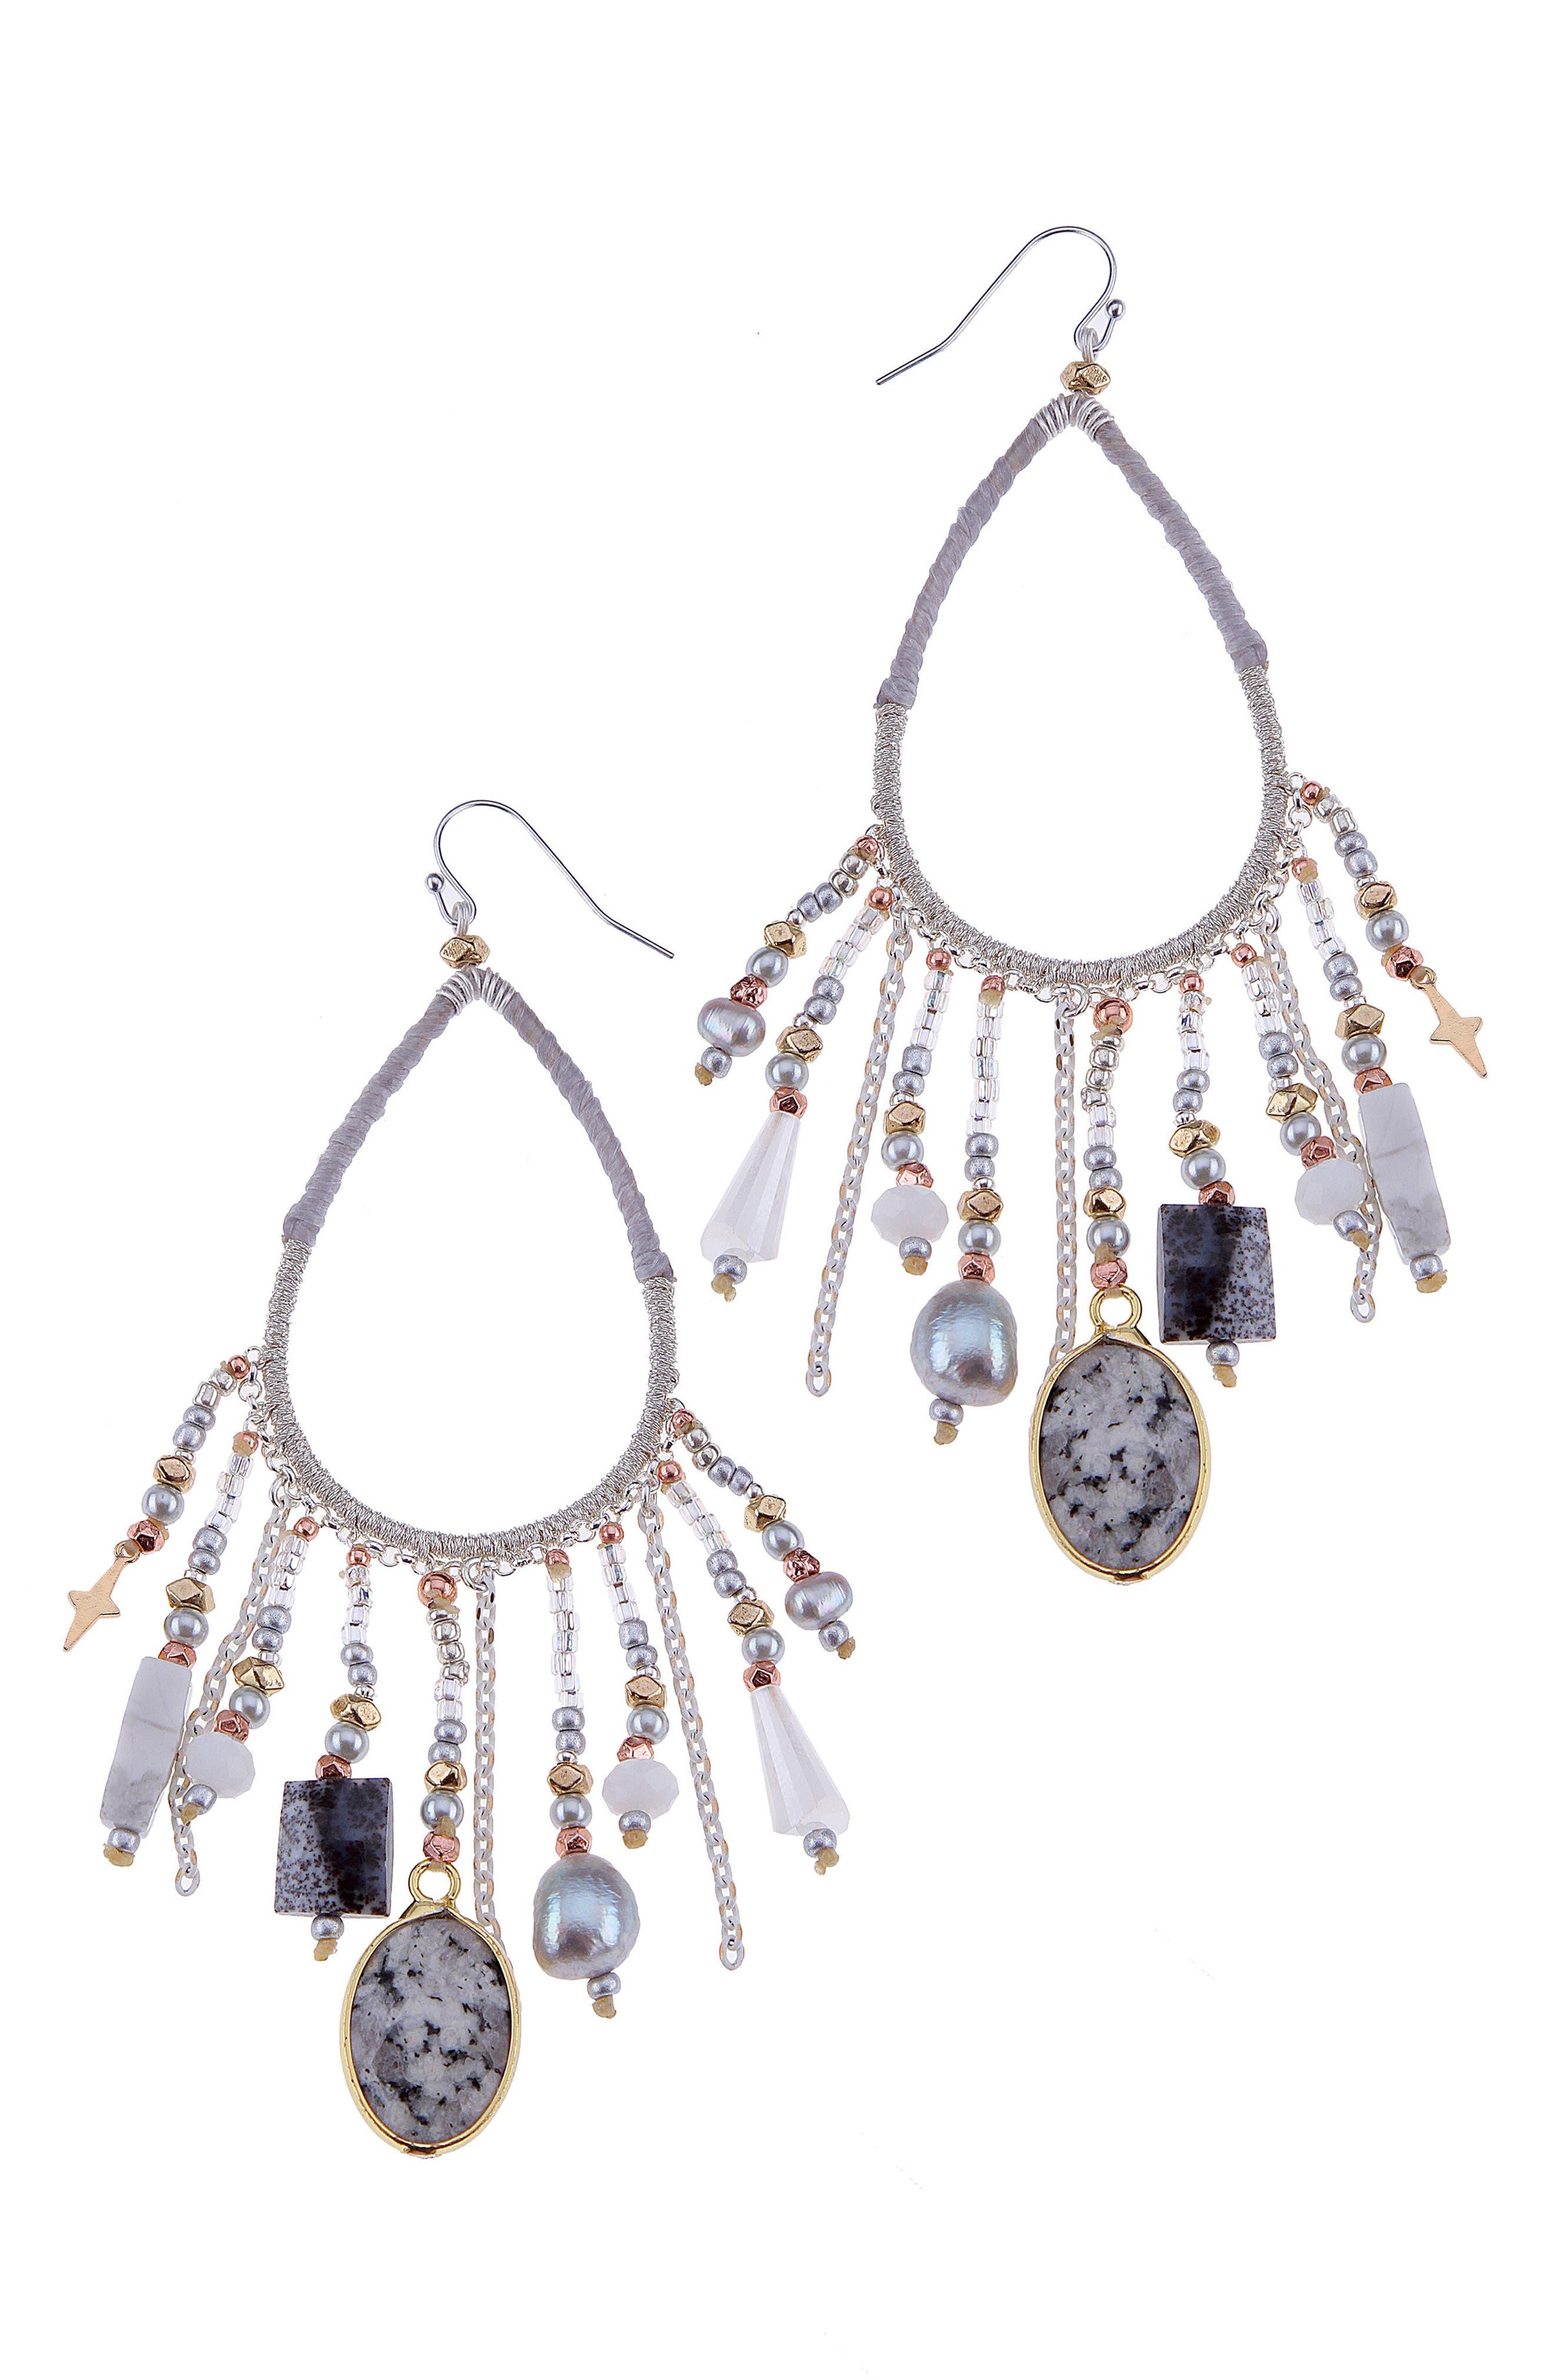 Stone & Star Charm Earrings,                             Main thumbnail 1, color,                             Grey